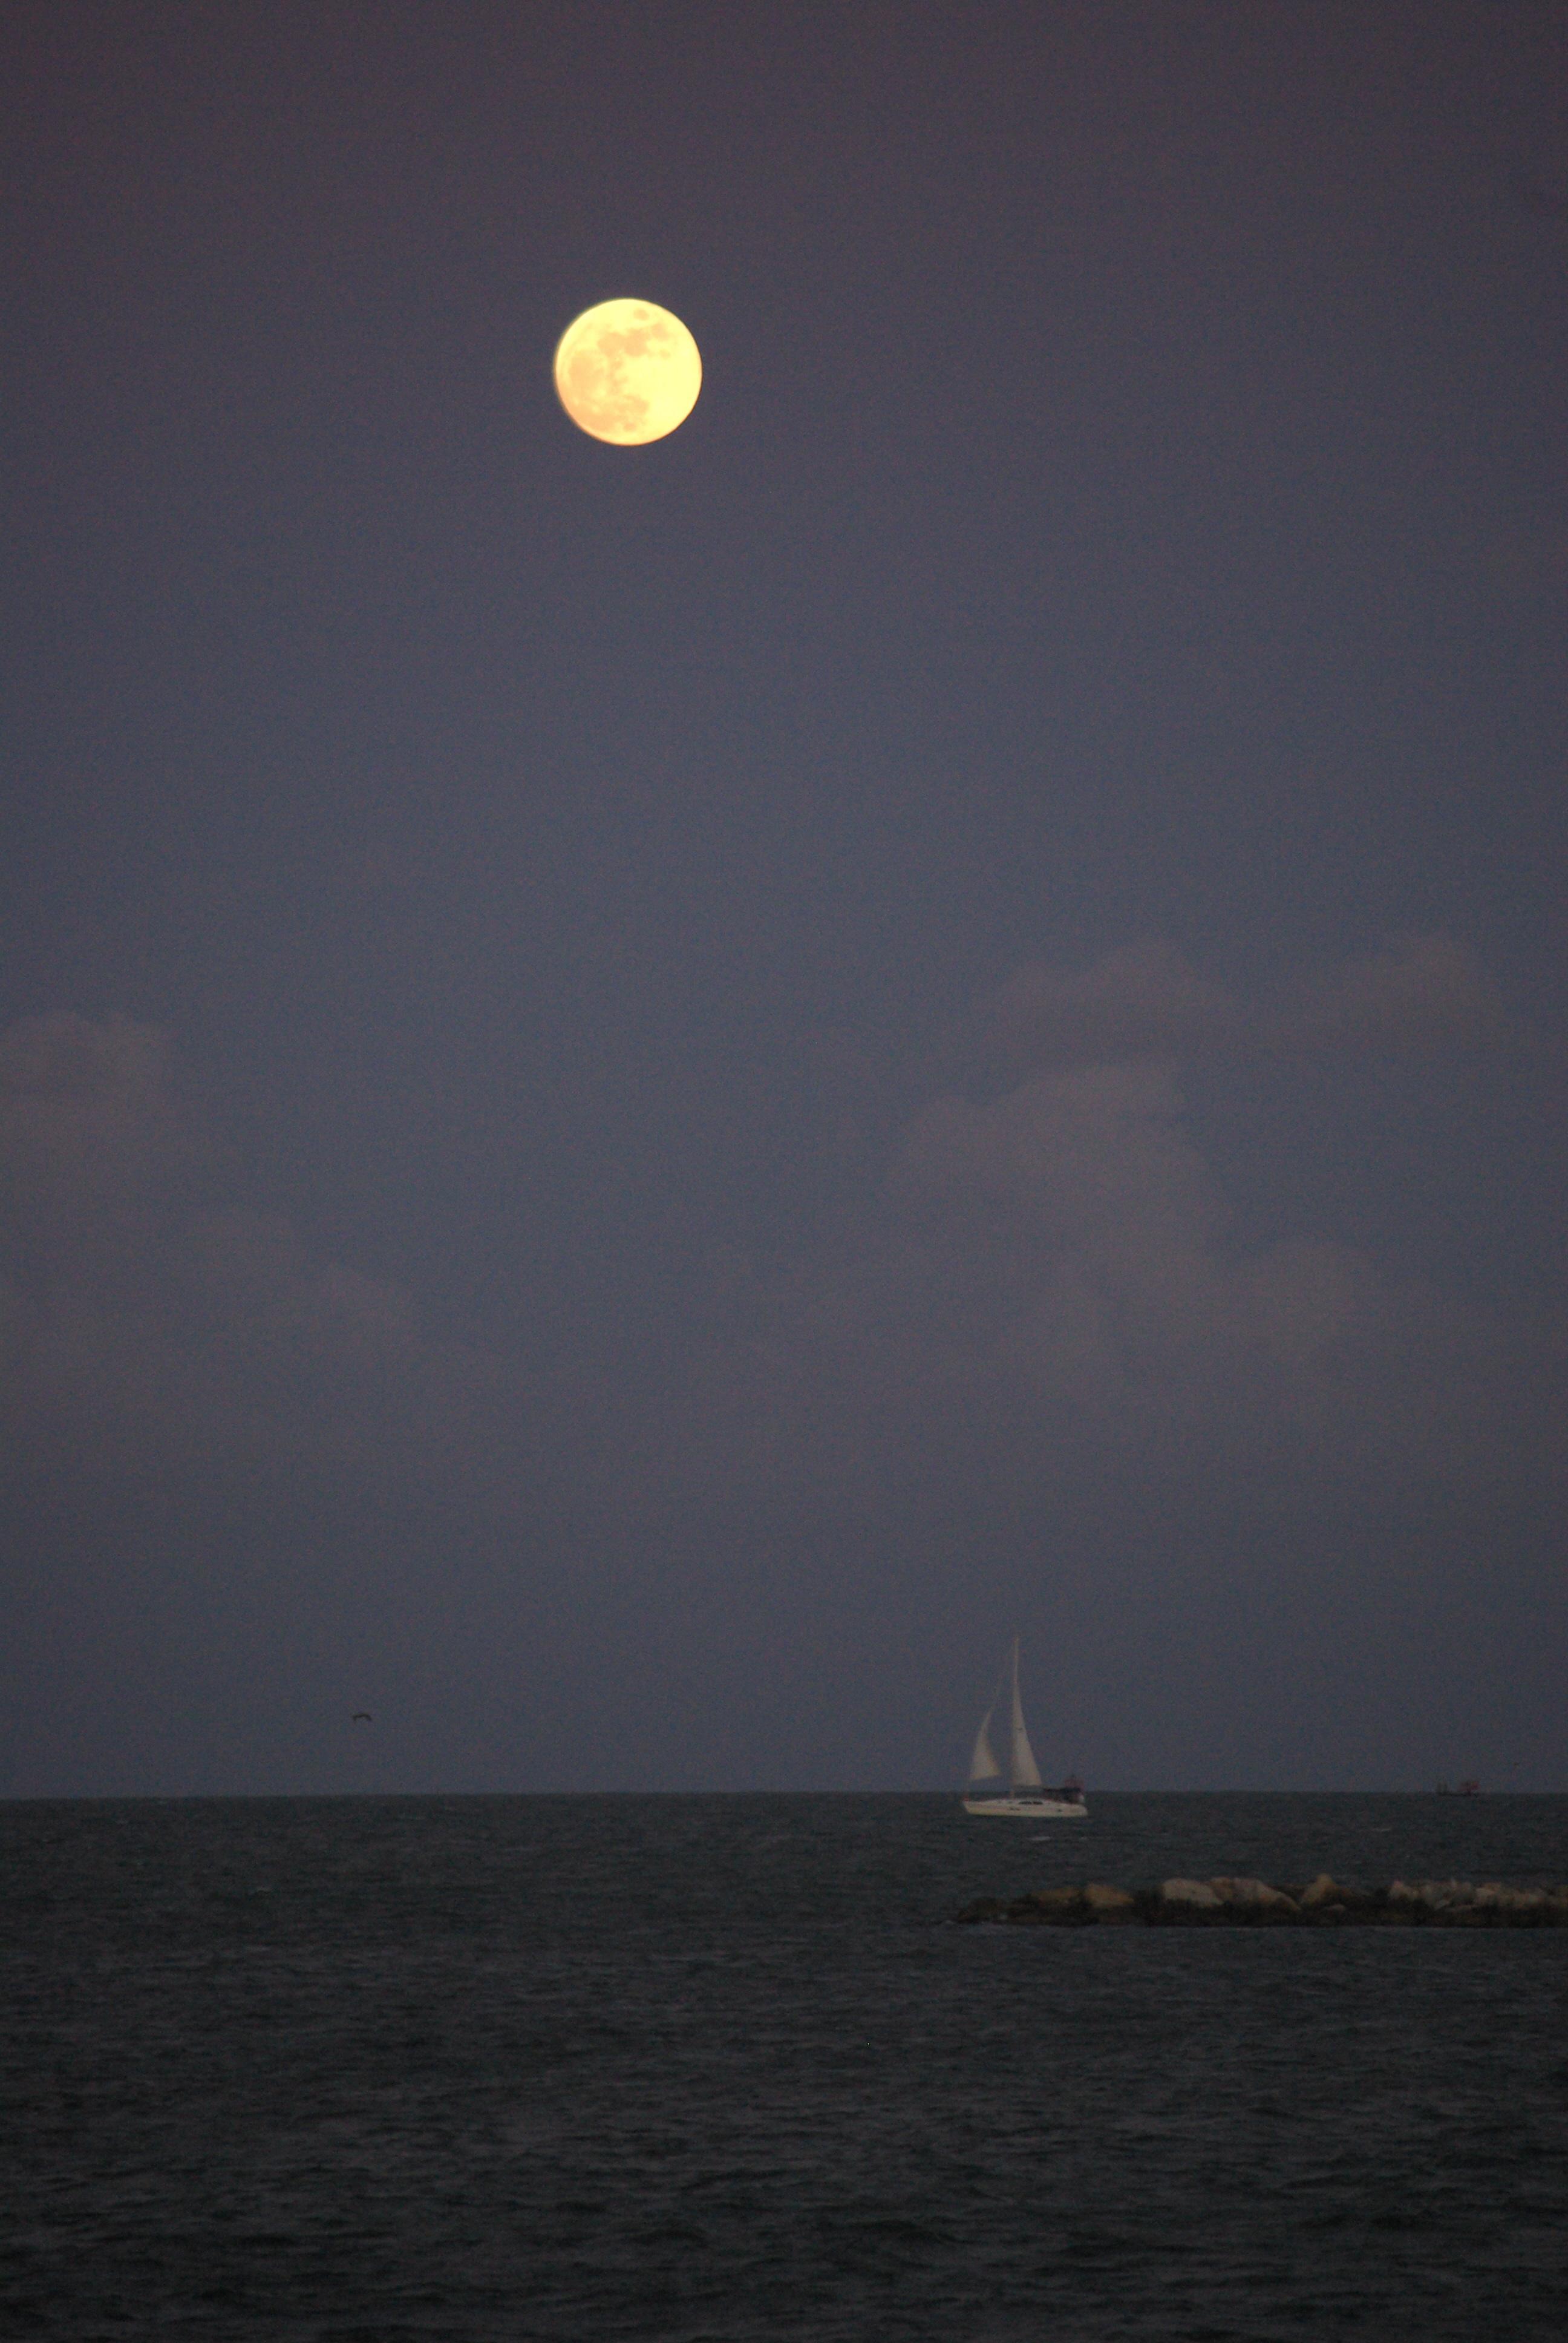 Moon over Corpus Christi Bay, June 25, 2010 - photo by Ed Darrell